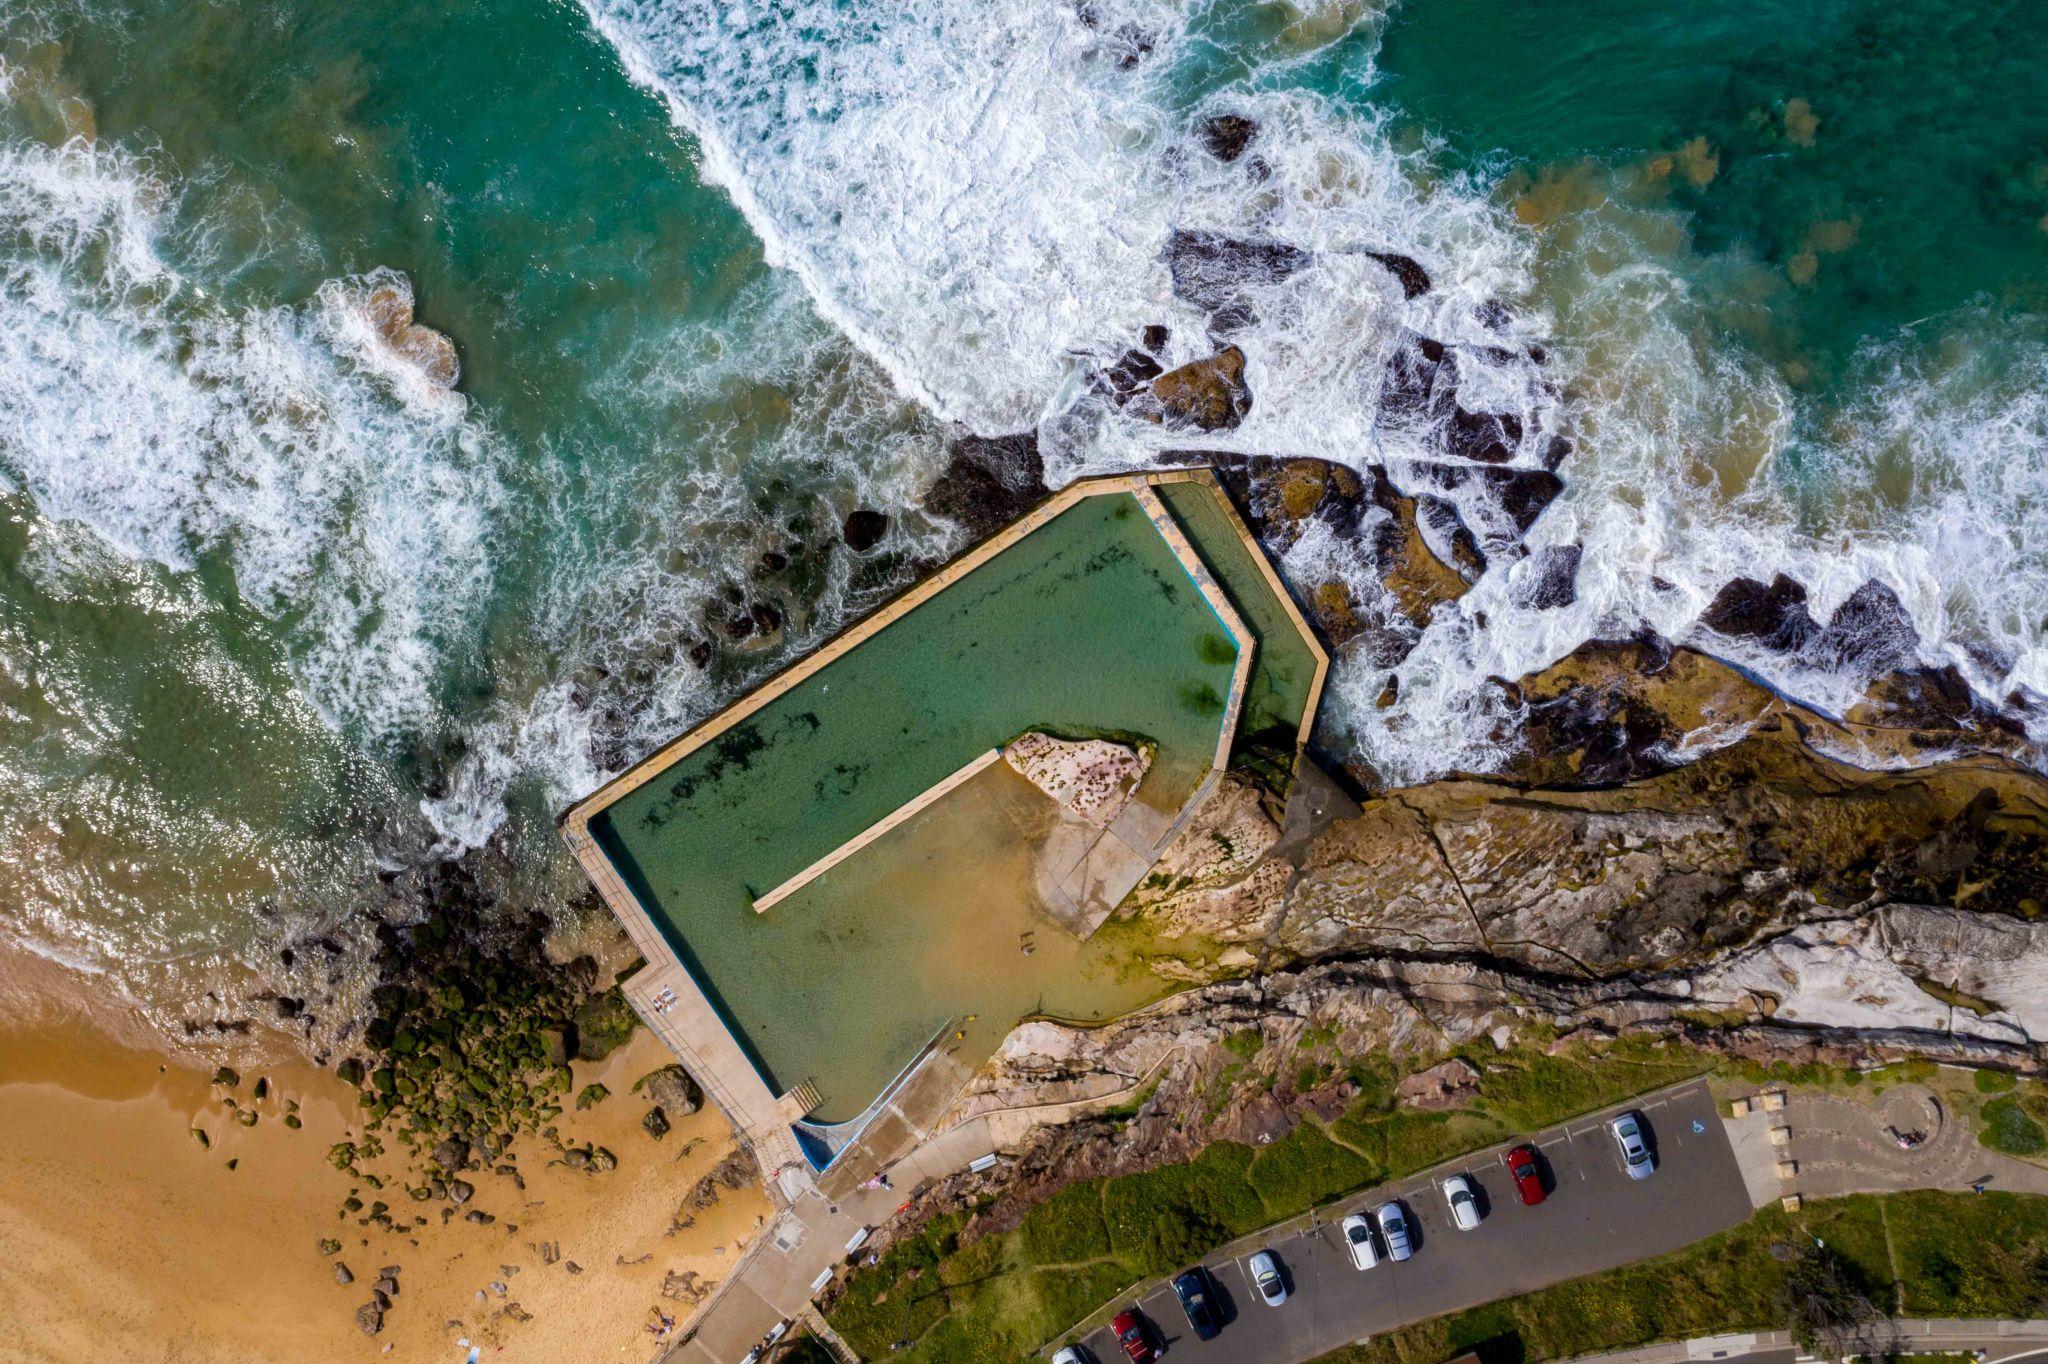 Ocean Pool South Curl Curl New South Wales, Australia